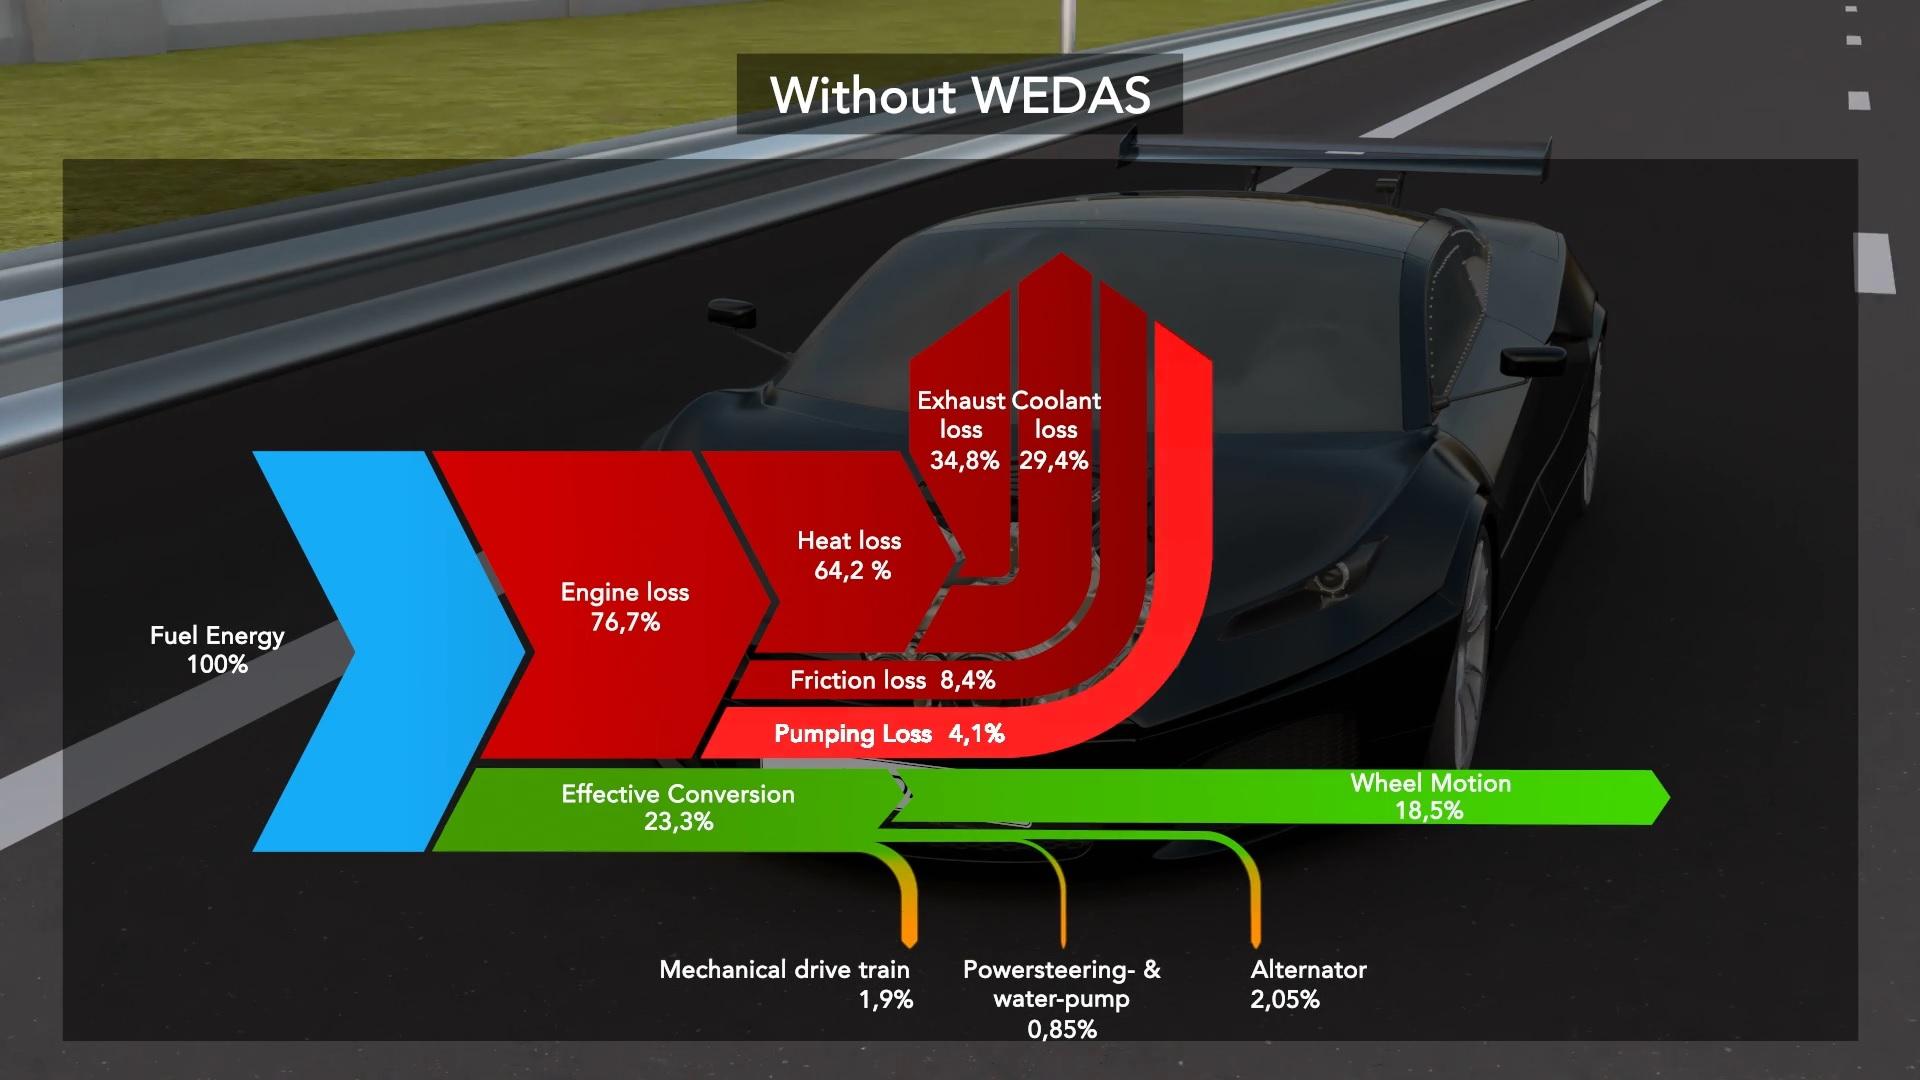 WEDAS_Advantages